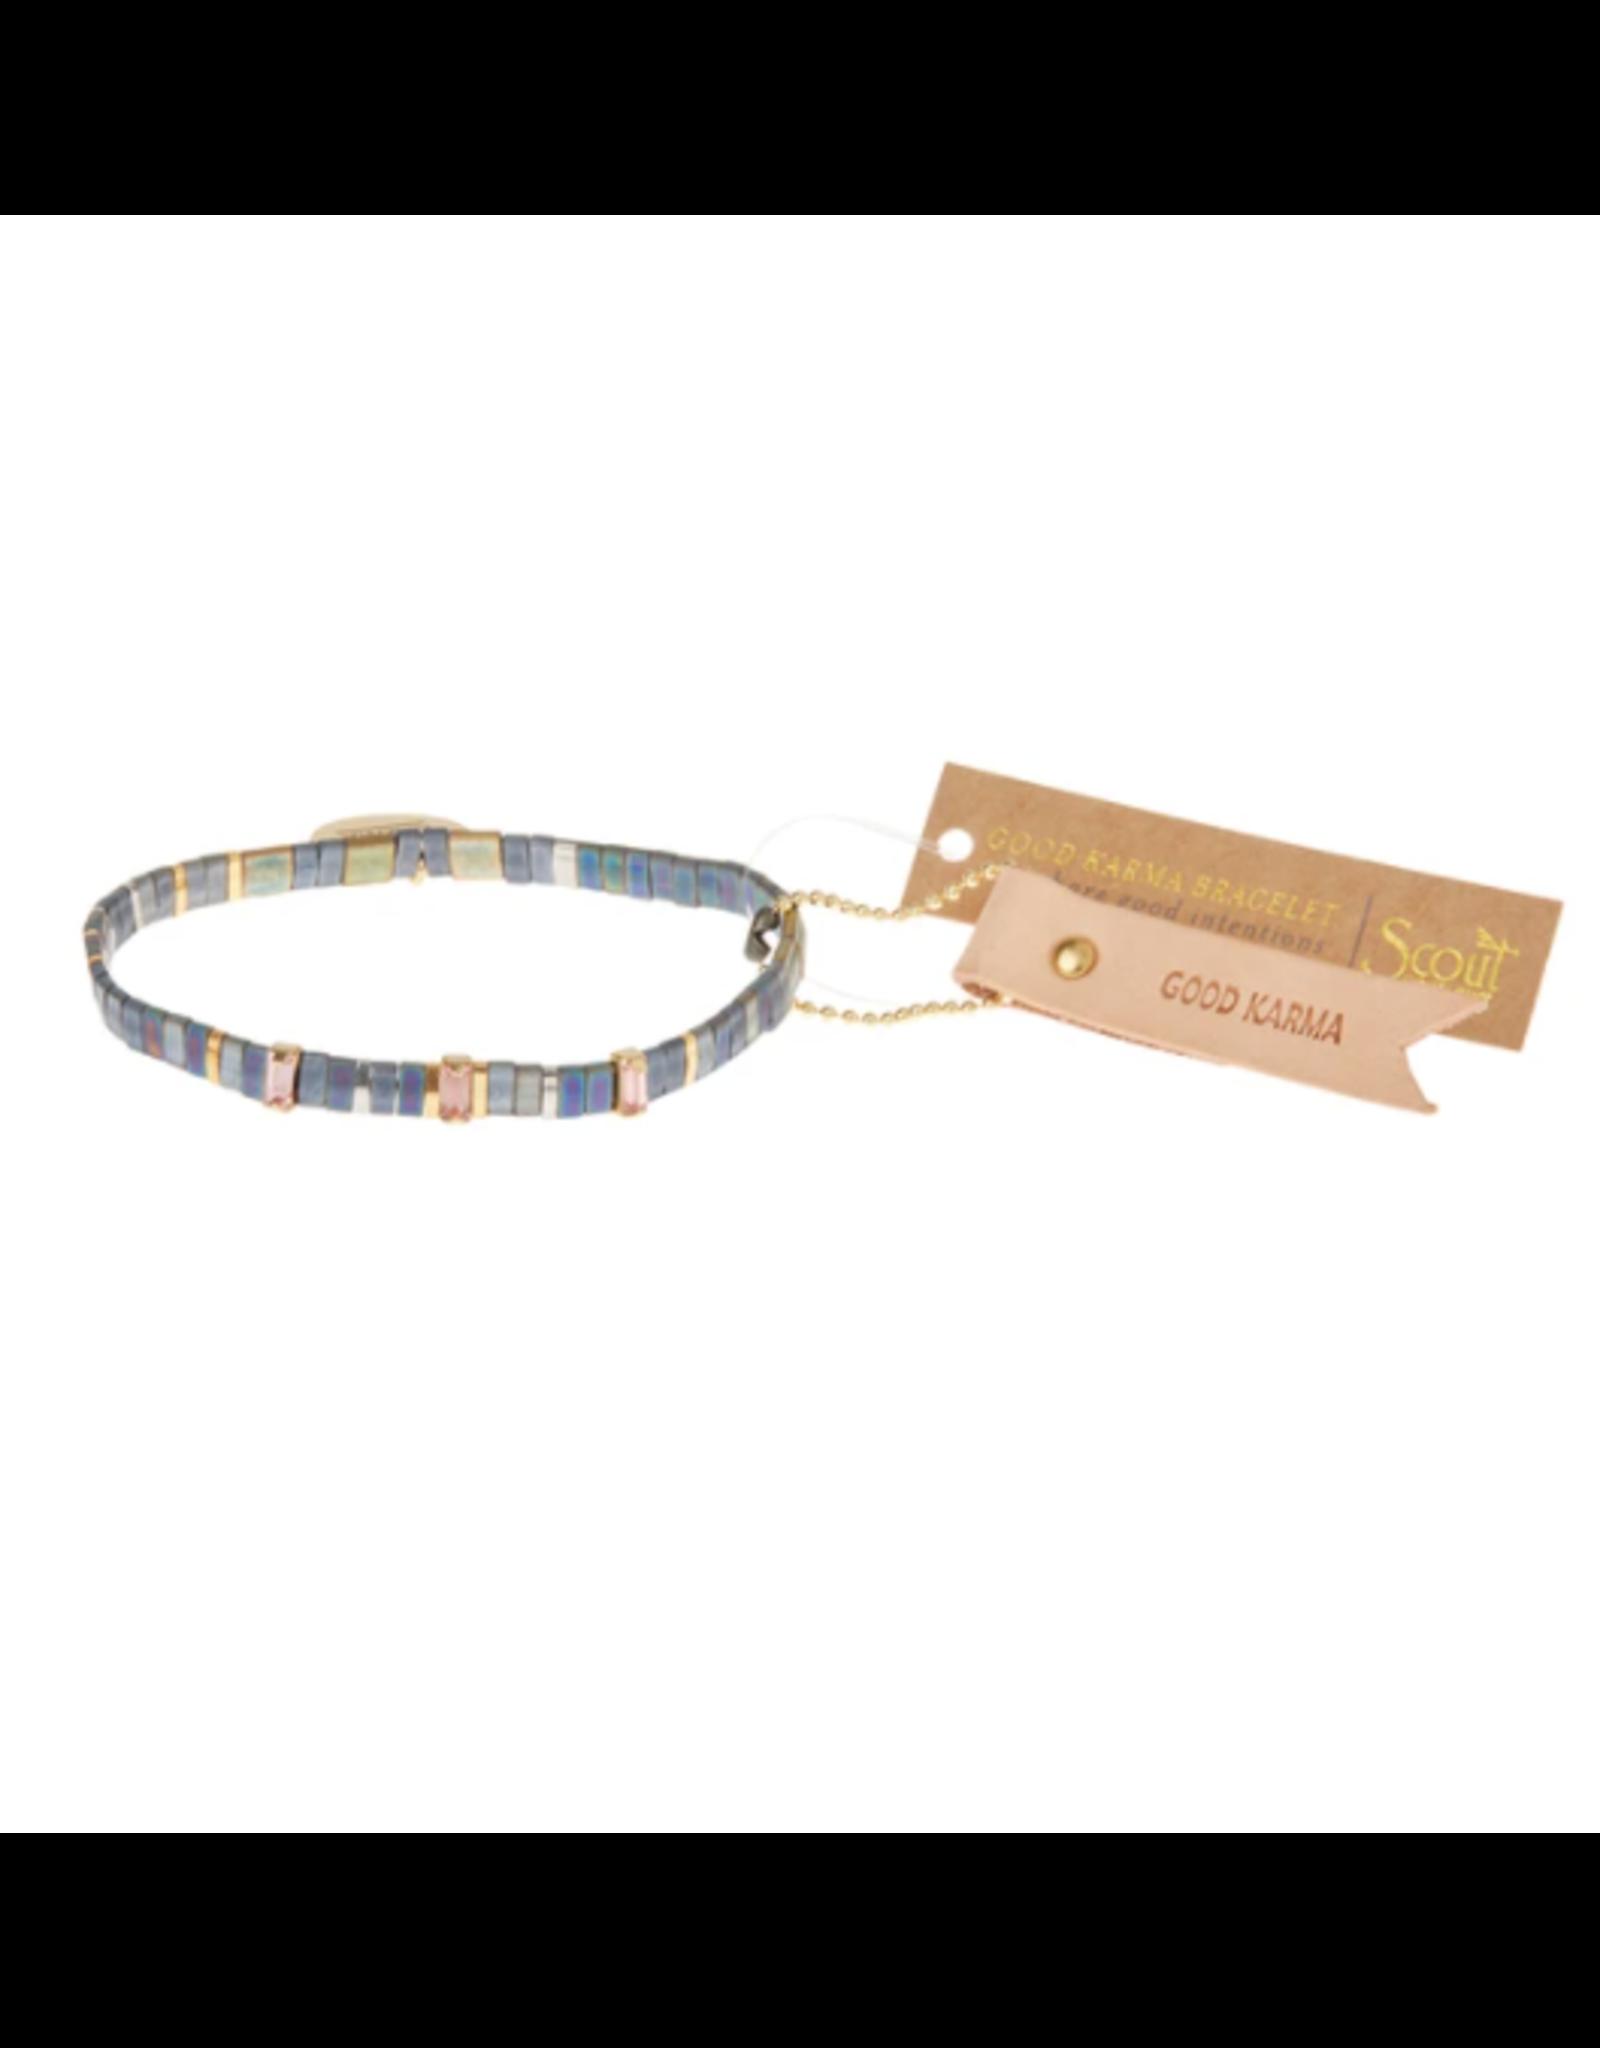 Good Karma Charm Bracelet, Good Karma, oil slick/sparkle/gold